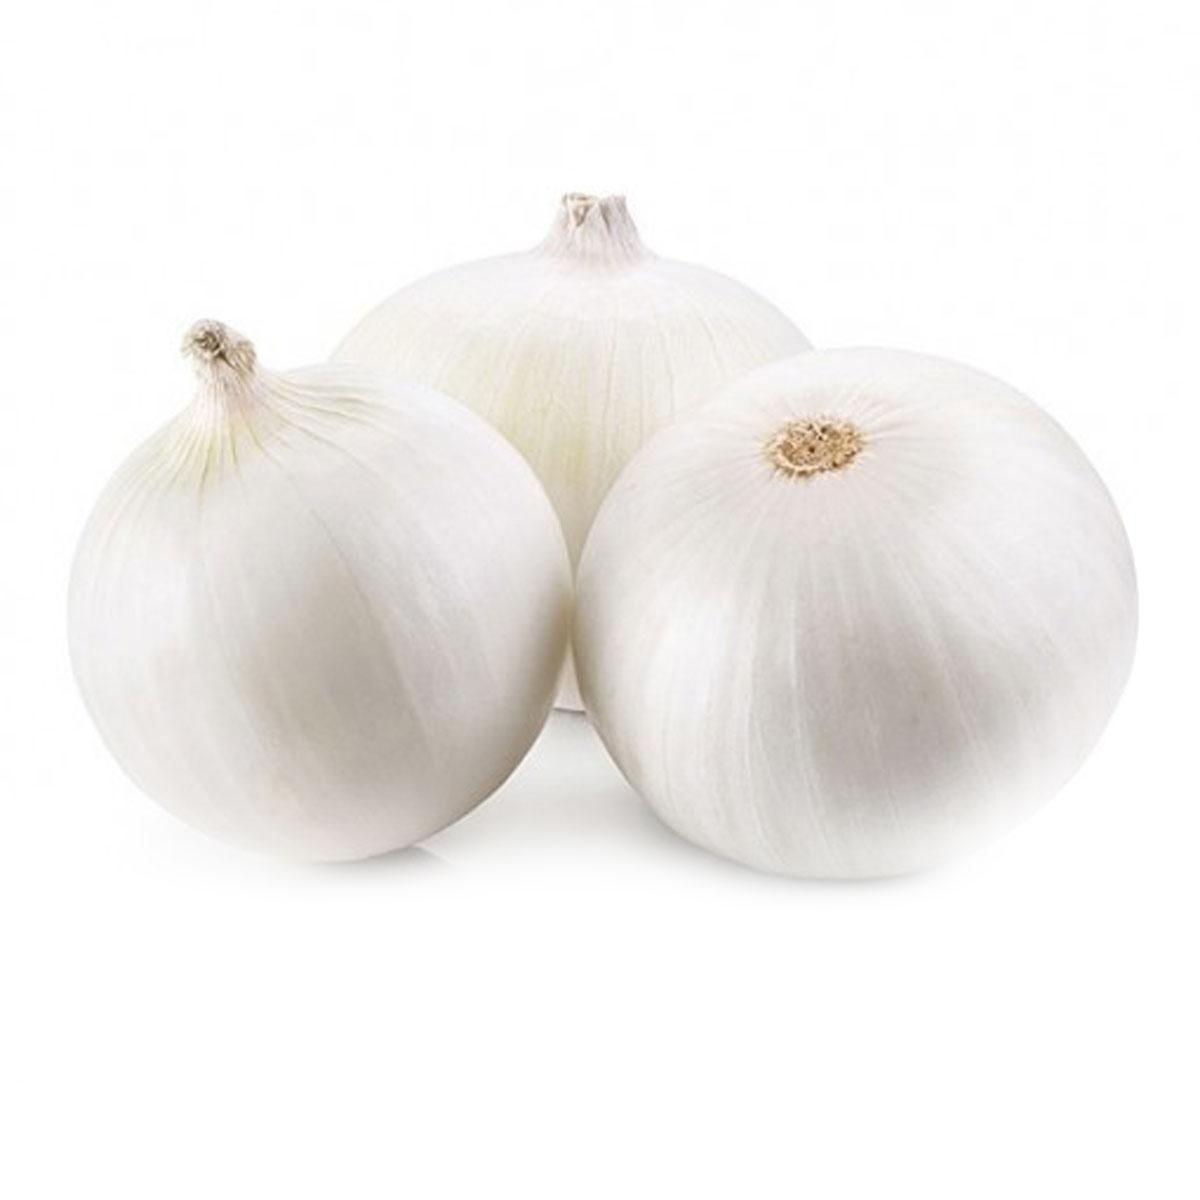 Onion White Spain